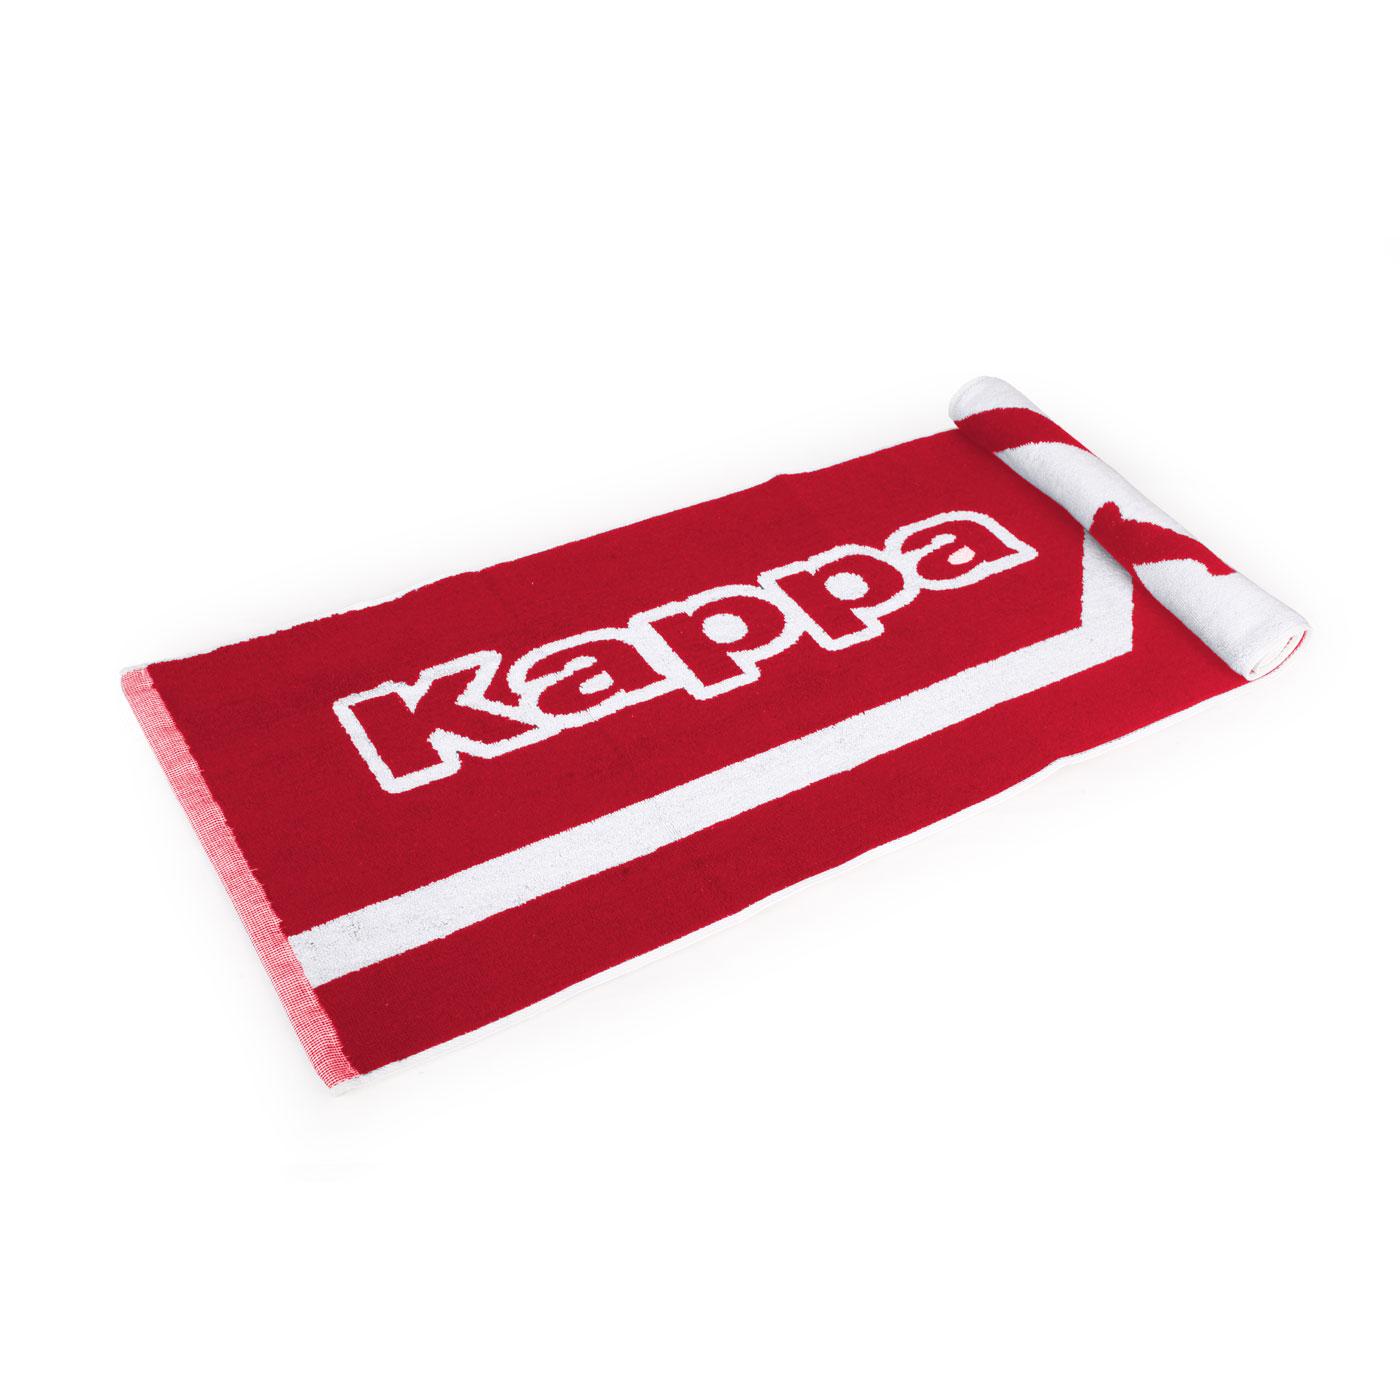 KAPPA 運動毛巾 304TTXD-915 - 紅白